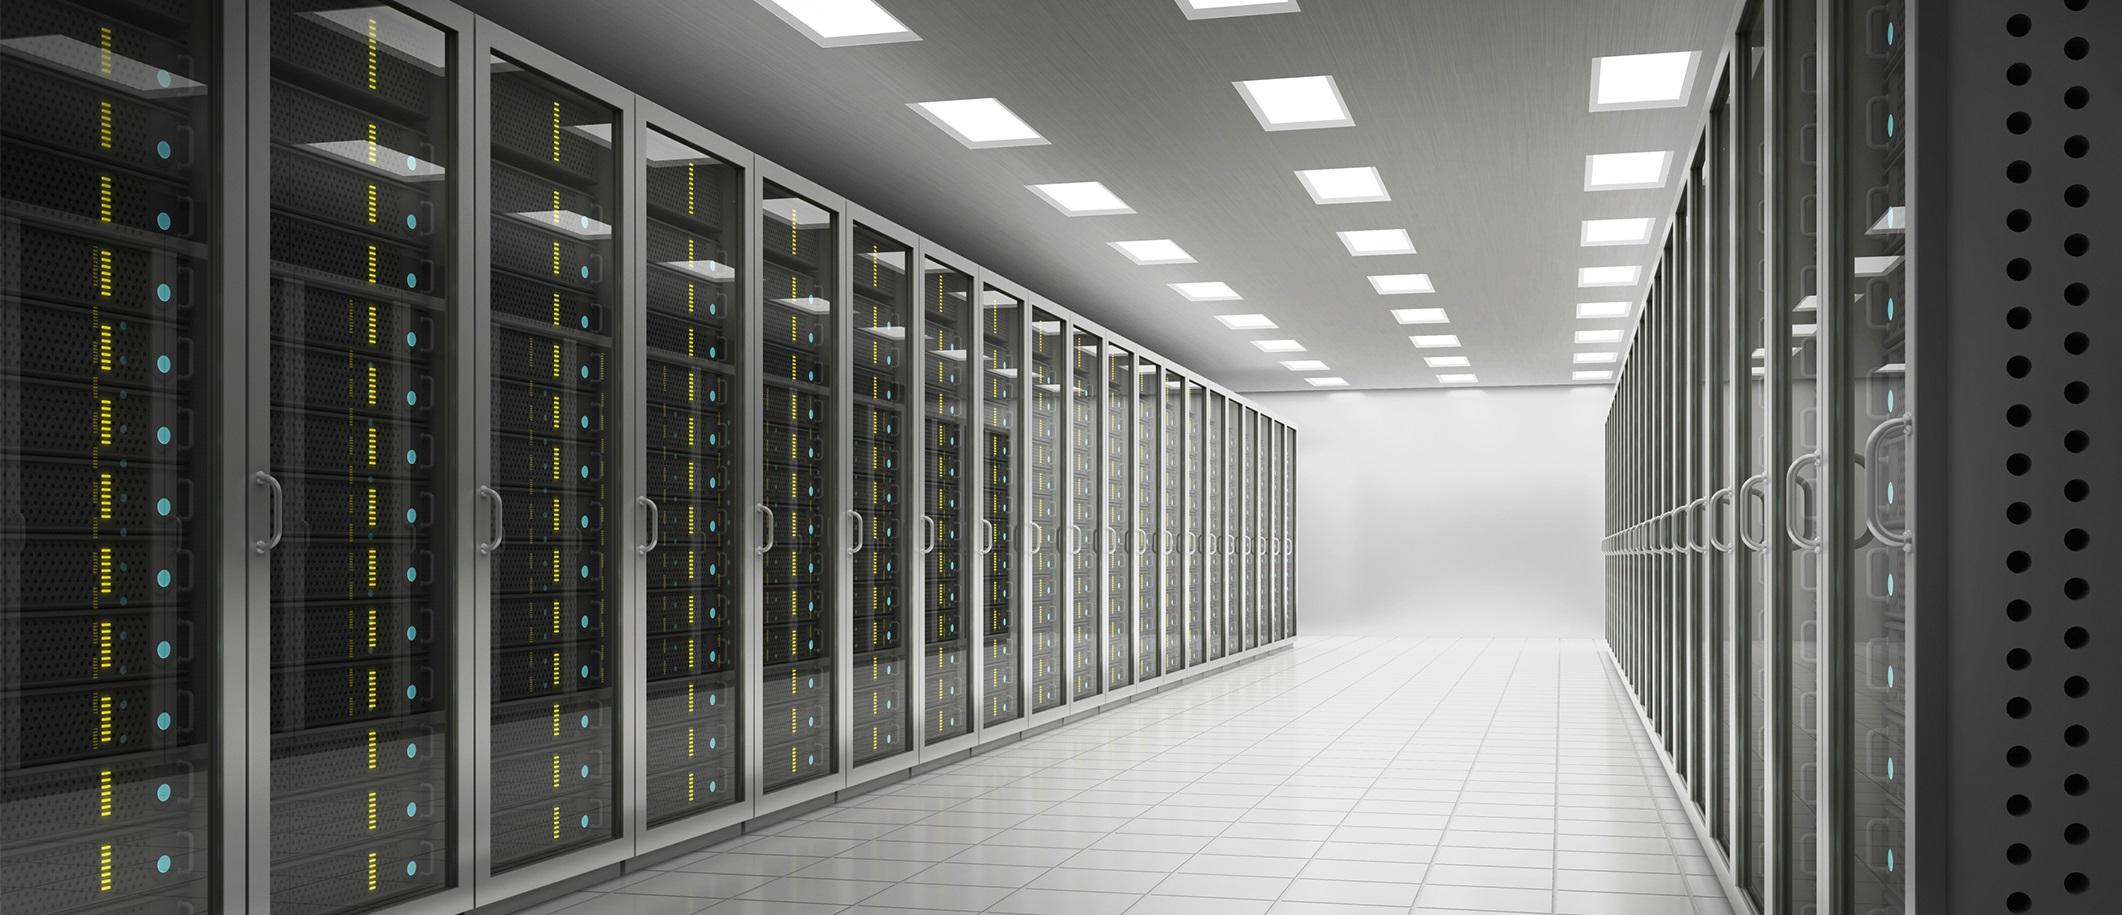 web_server2